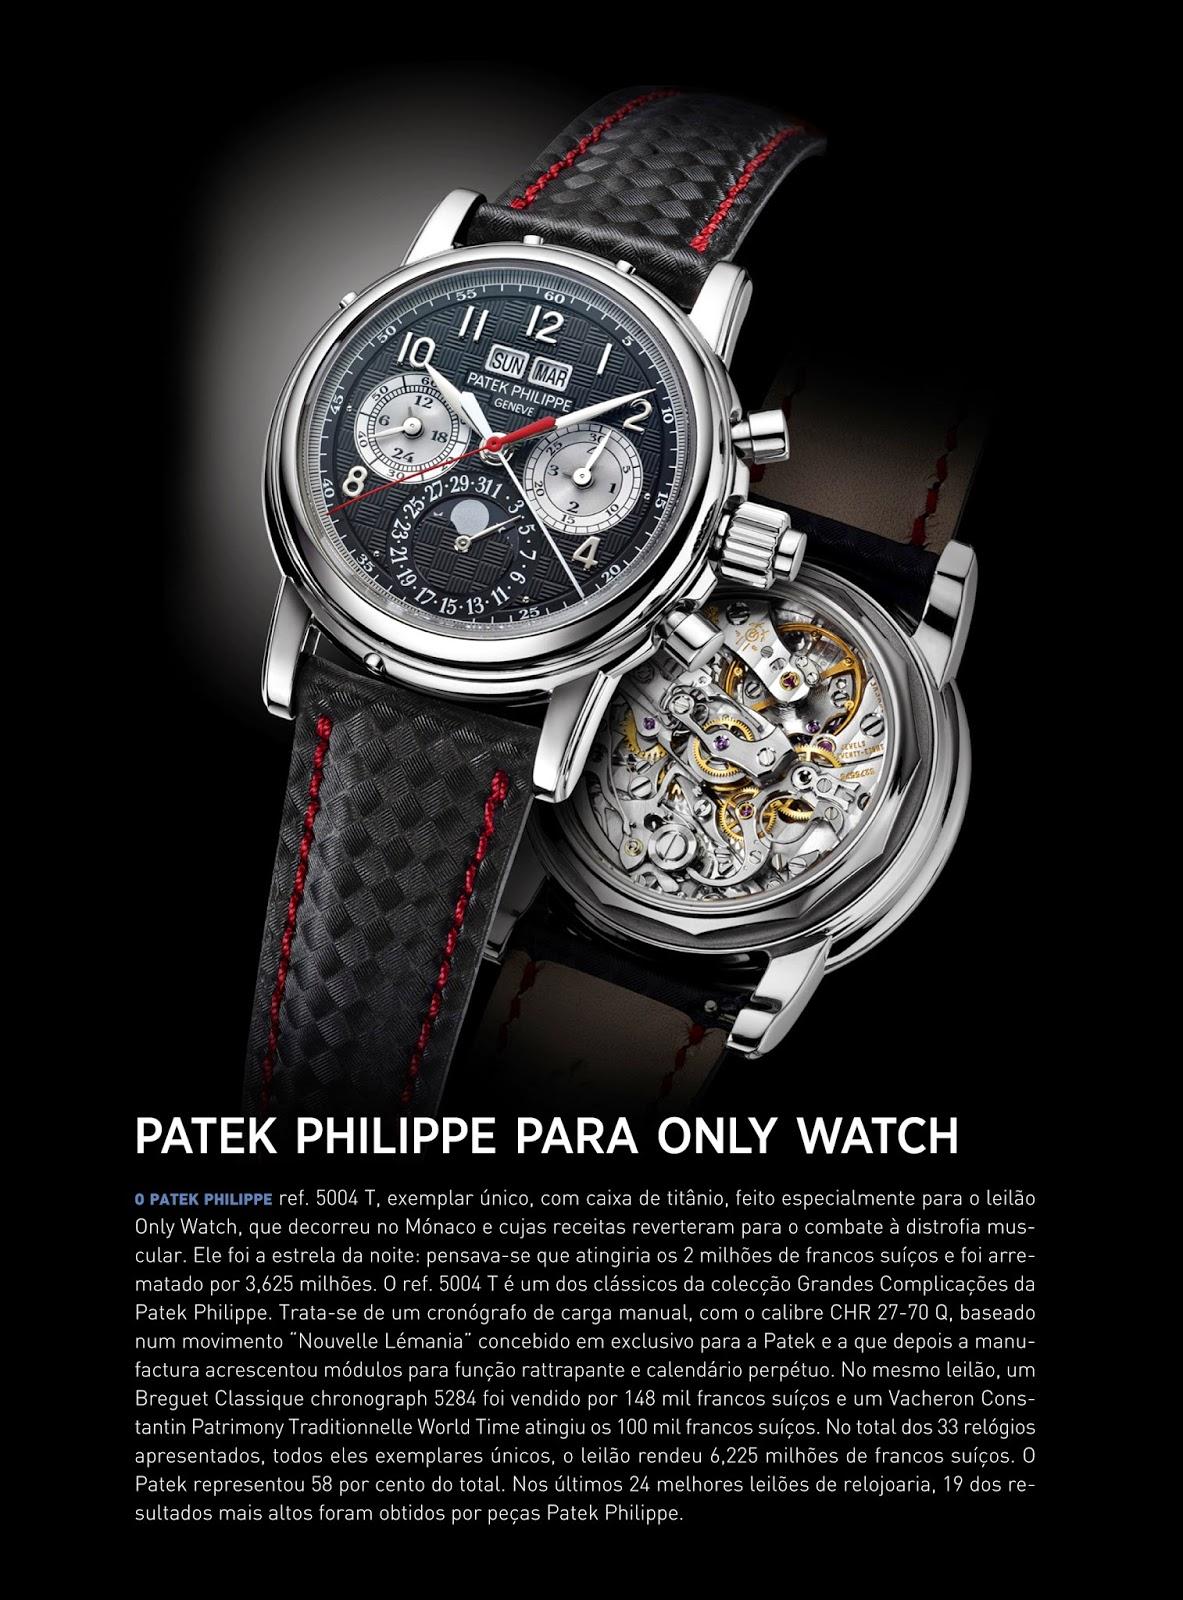 994584927d8 Estação Cronográfica  Relógio Patek Philippe para Only Watch